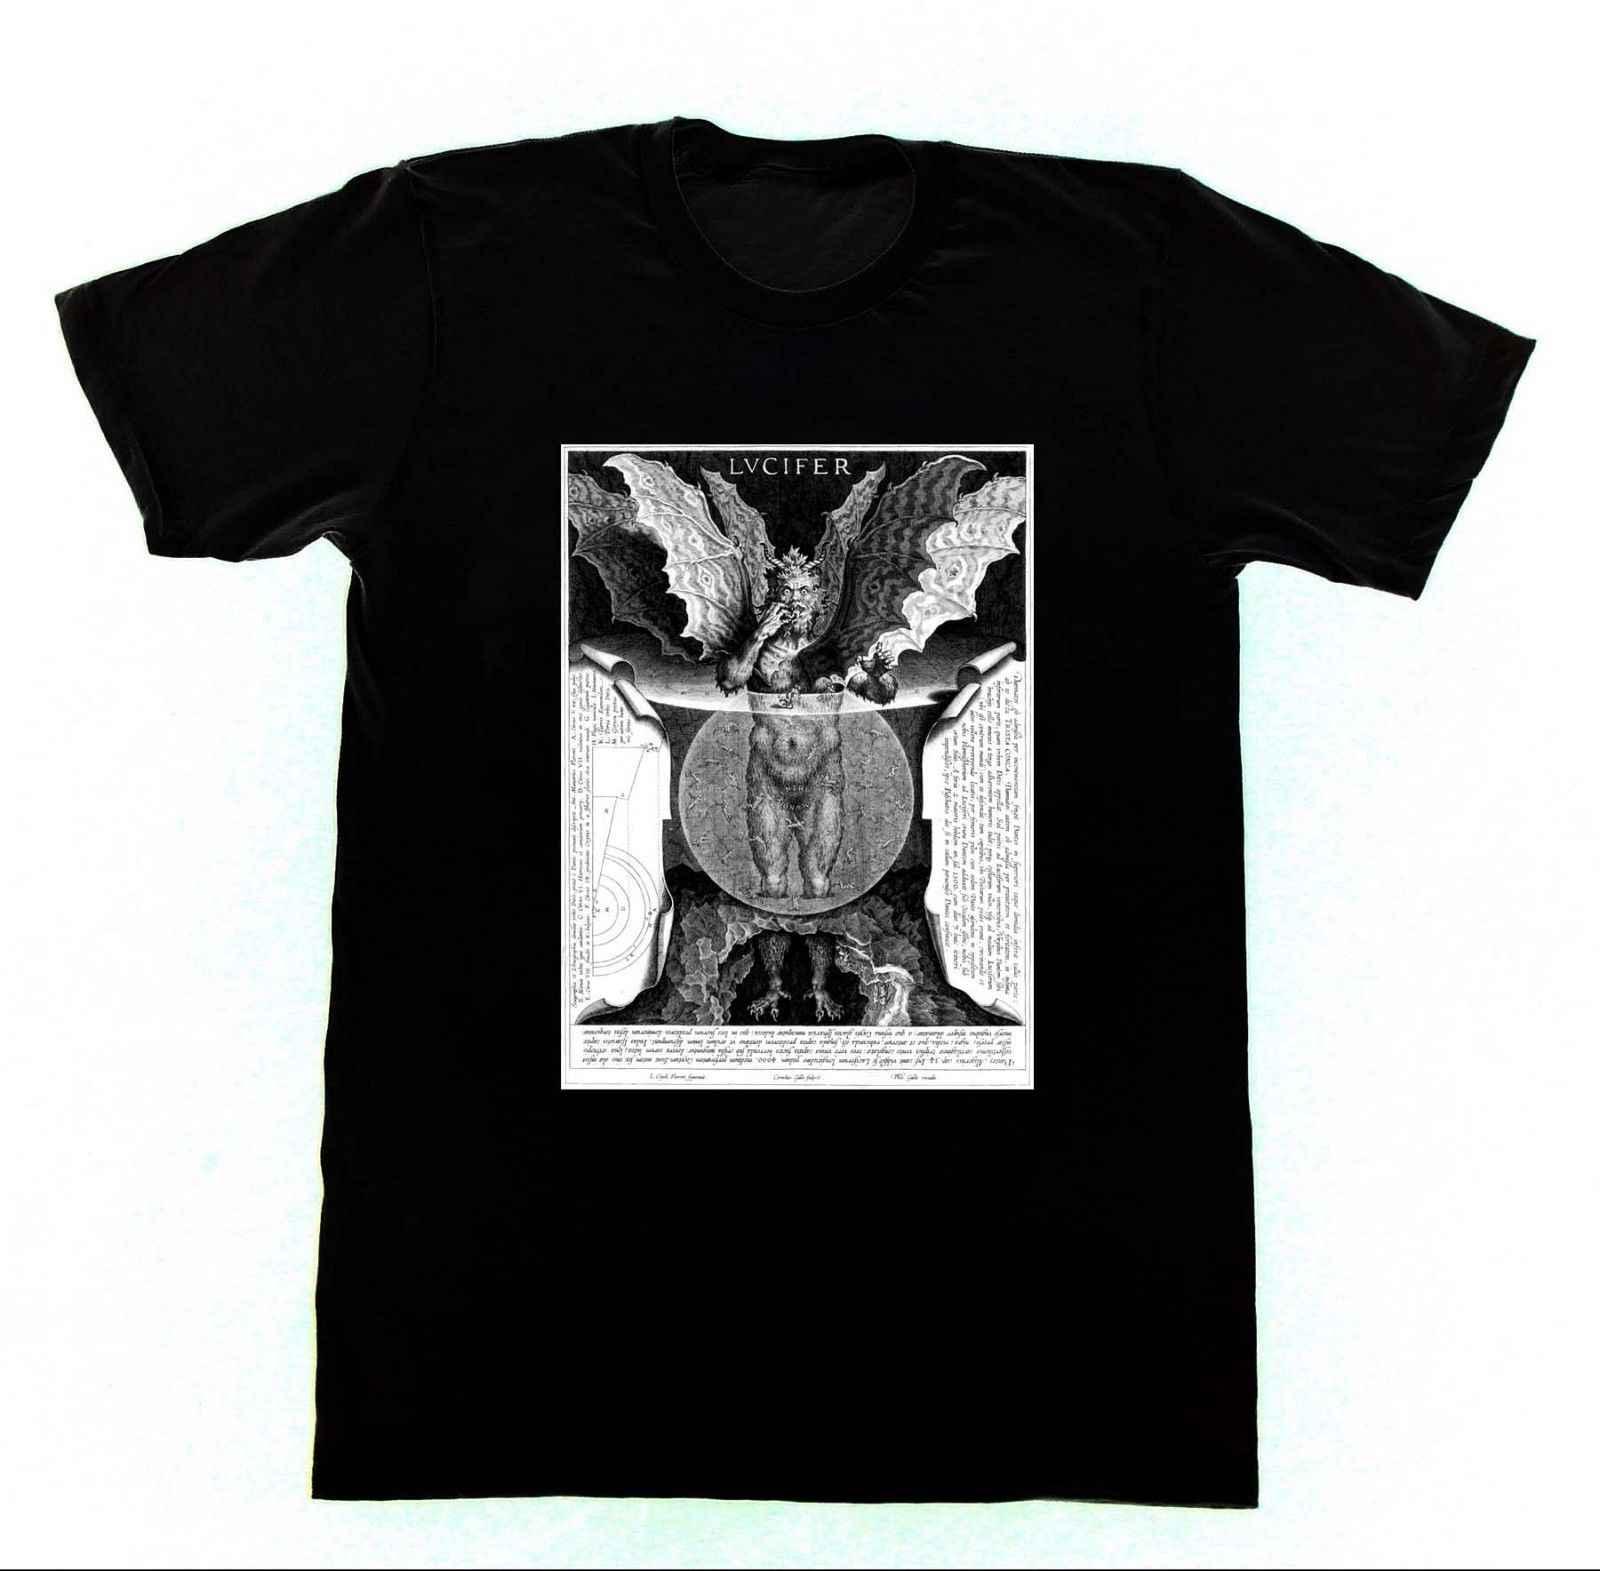 Люцифер-Данте Inferno-футболка церковь с мотивом пентаграммы колдовство Летний стиль хип-хоп для мужчин футболки